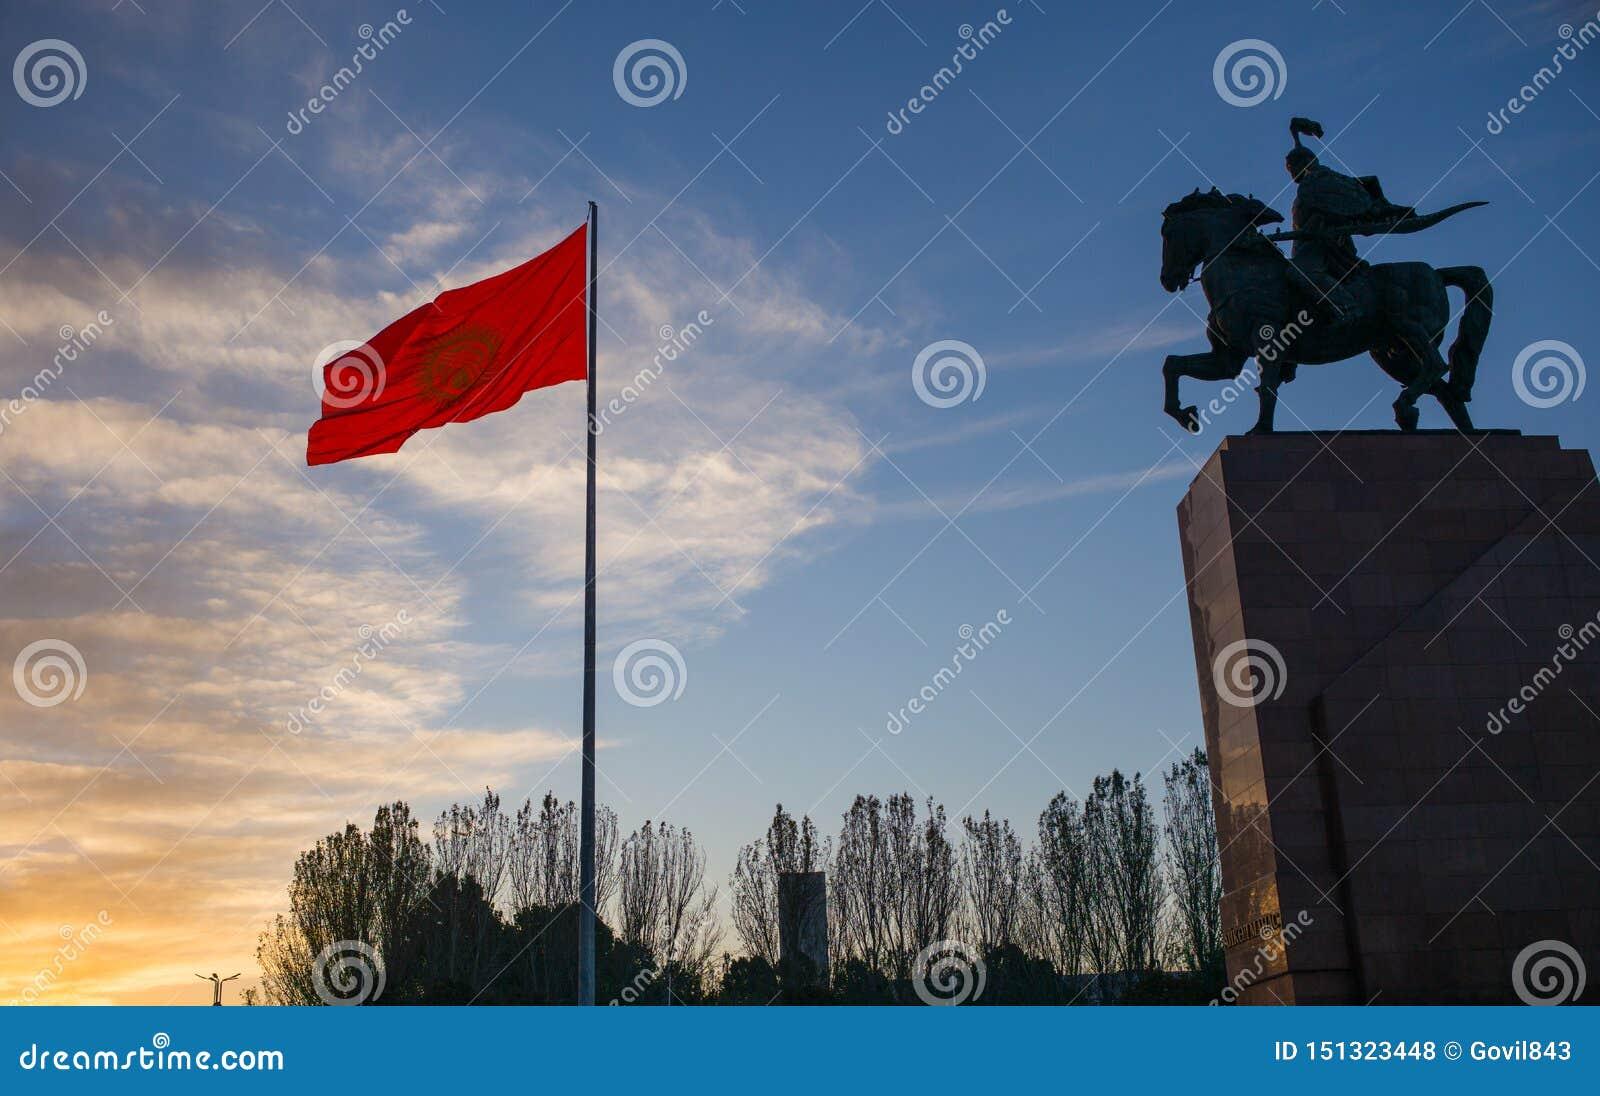 Bishkek, Kyrgyzstan: Monument voor Manas, held van oude kyrgyz epos, samen met de nationale vlag van Kyrgyzstan op centrale Al va